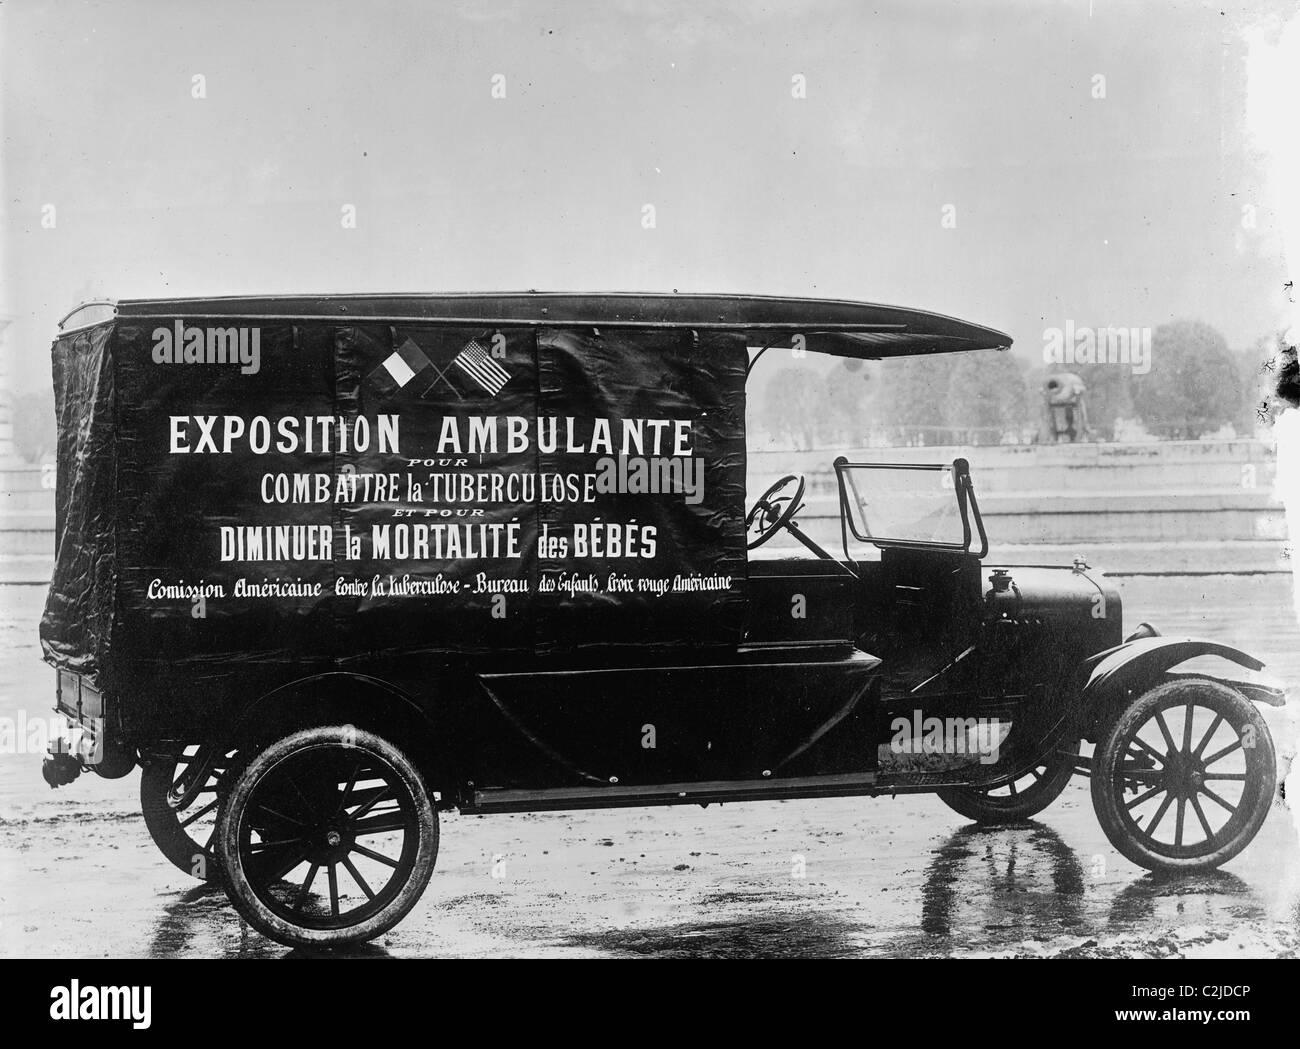 French-American World War I Ambulance at the Ready - Stock Image